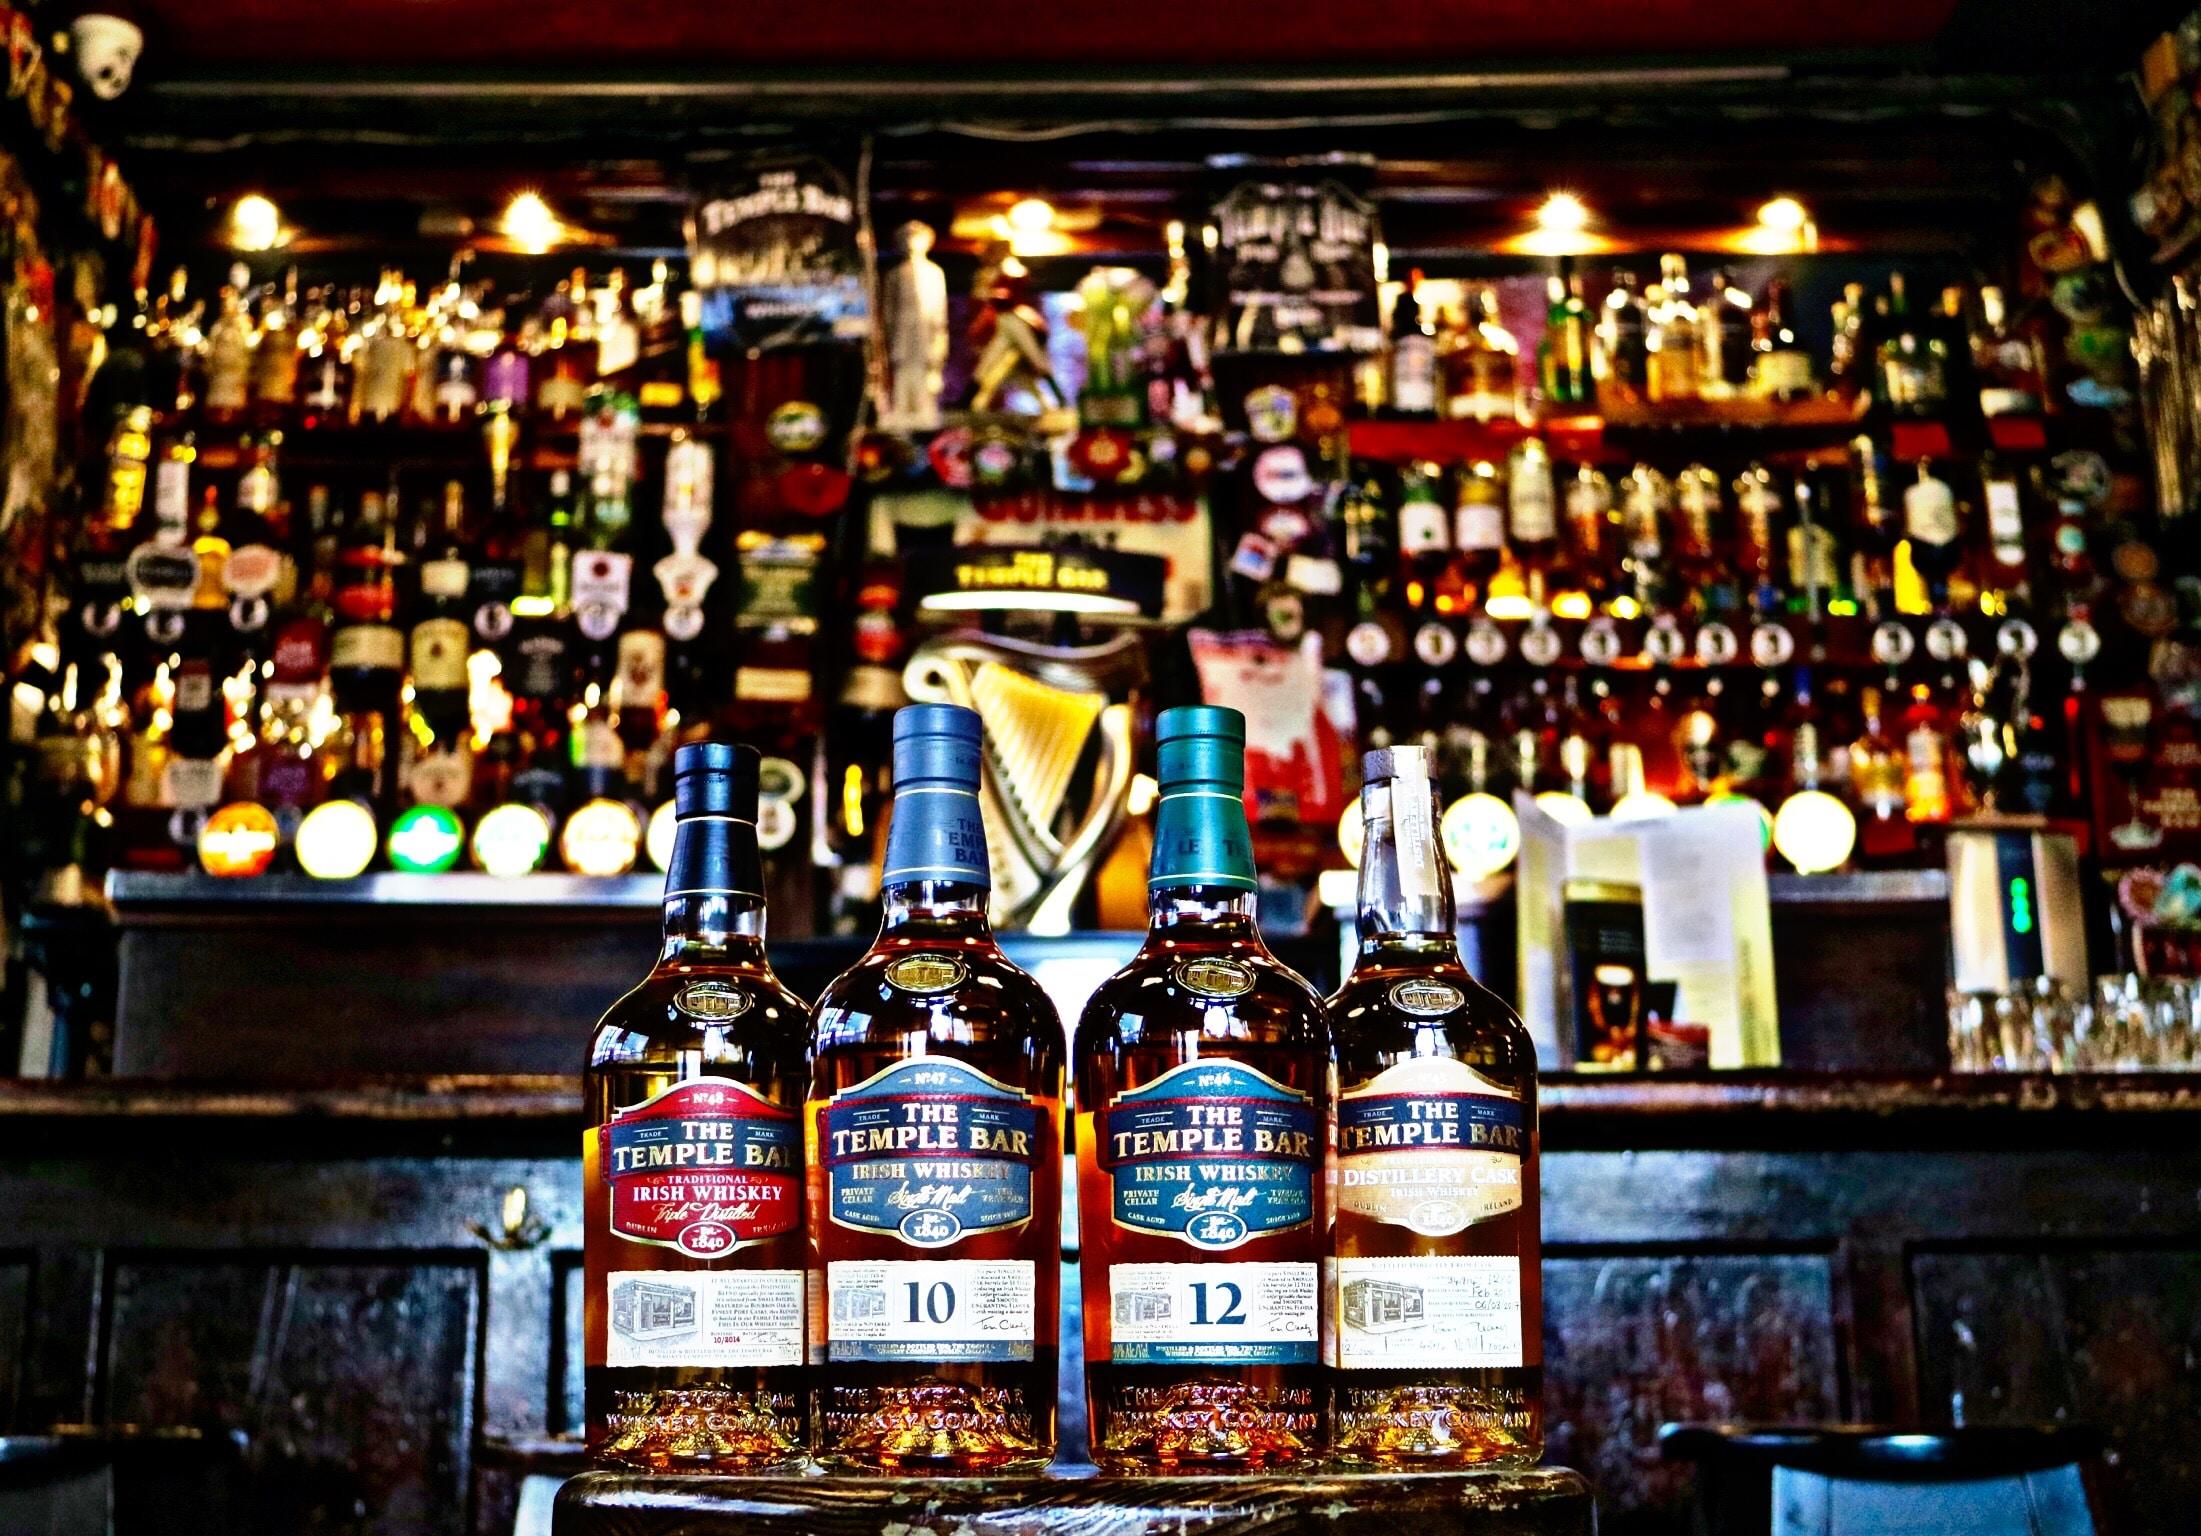 four whiskey bottles in bar counter